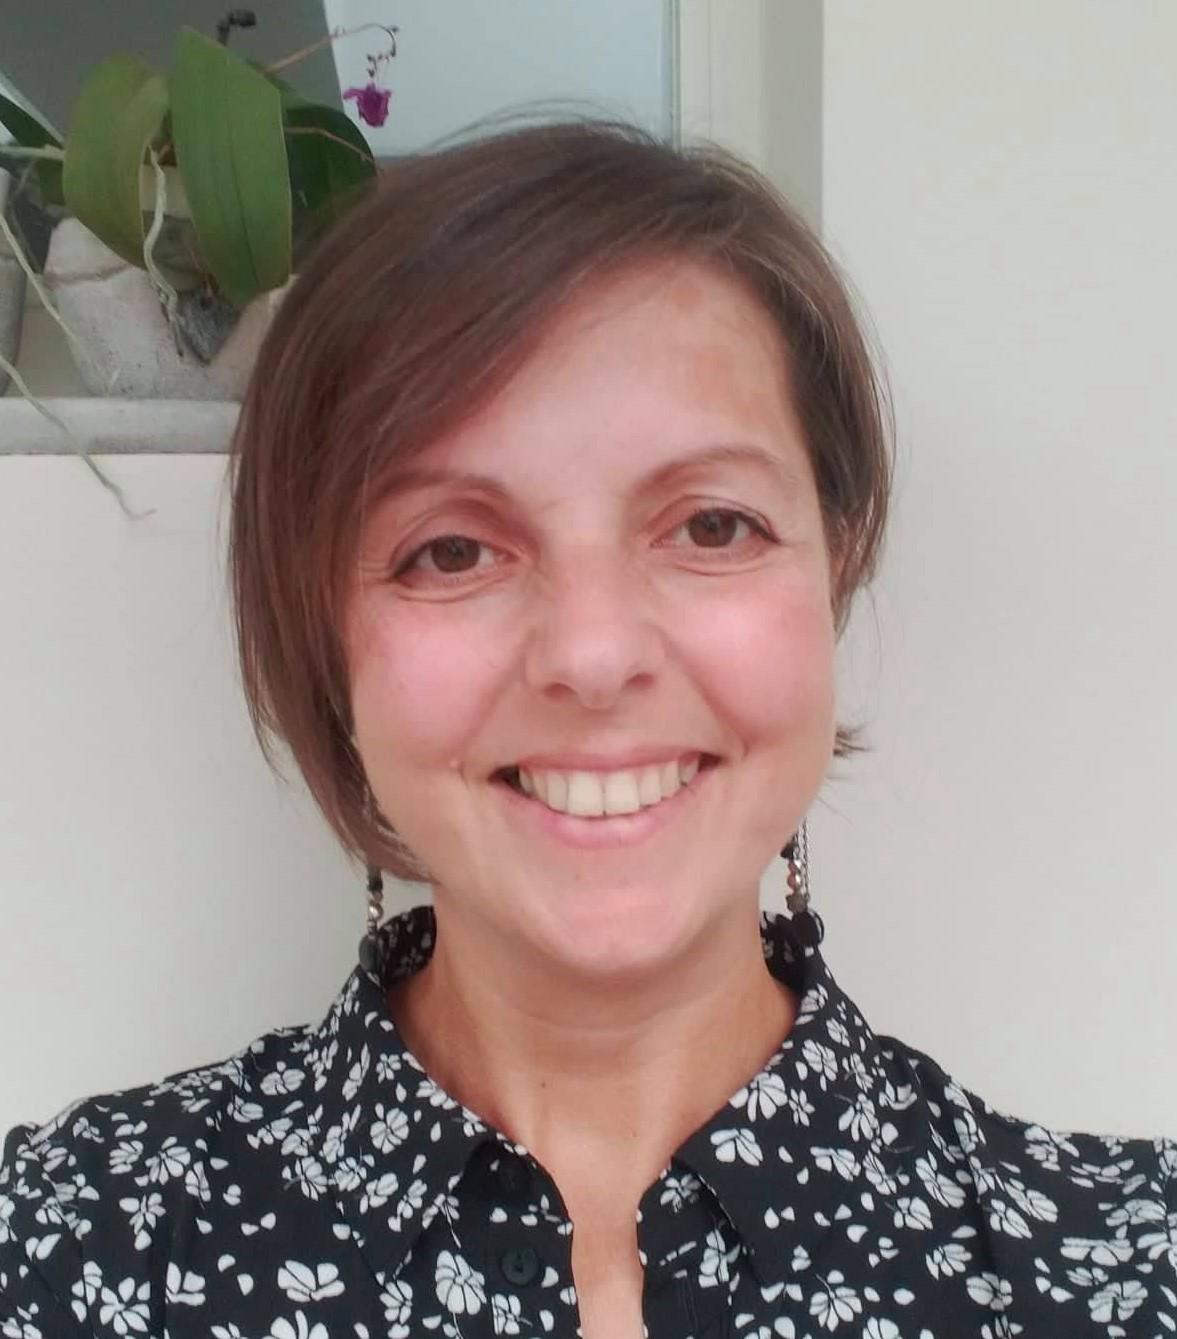 Déborah Lorenzi, SMART Ambassador